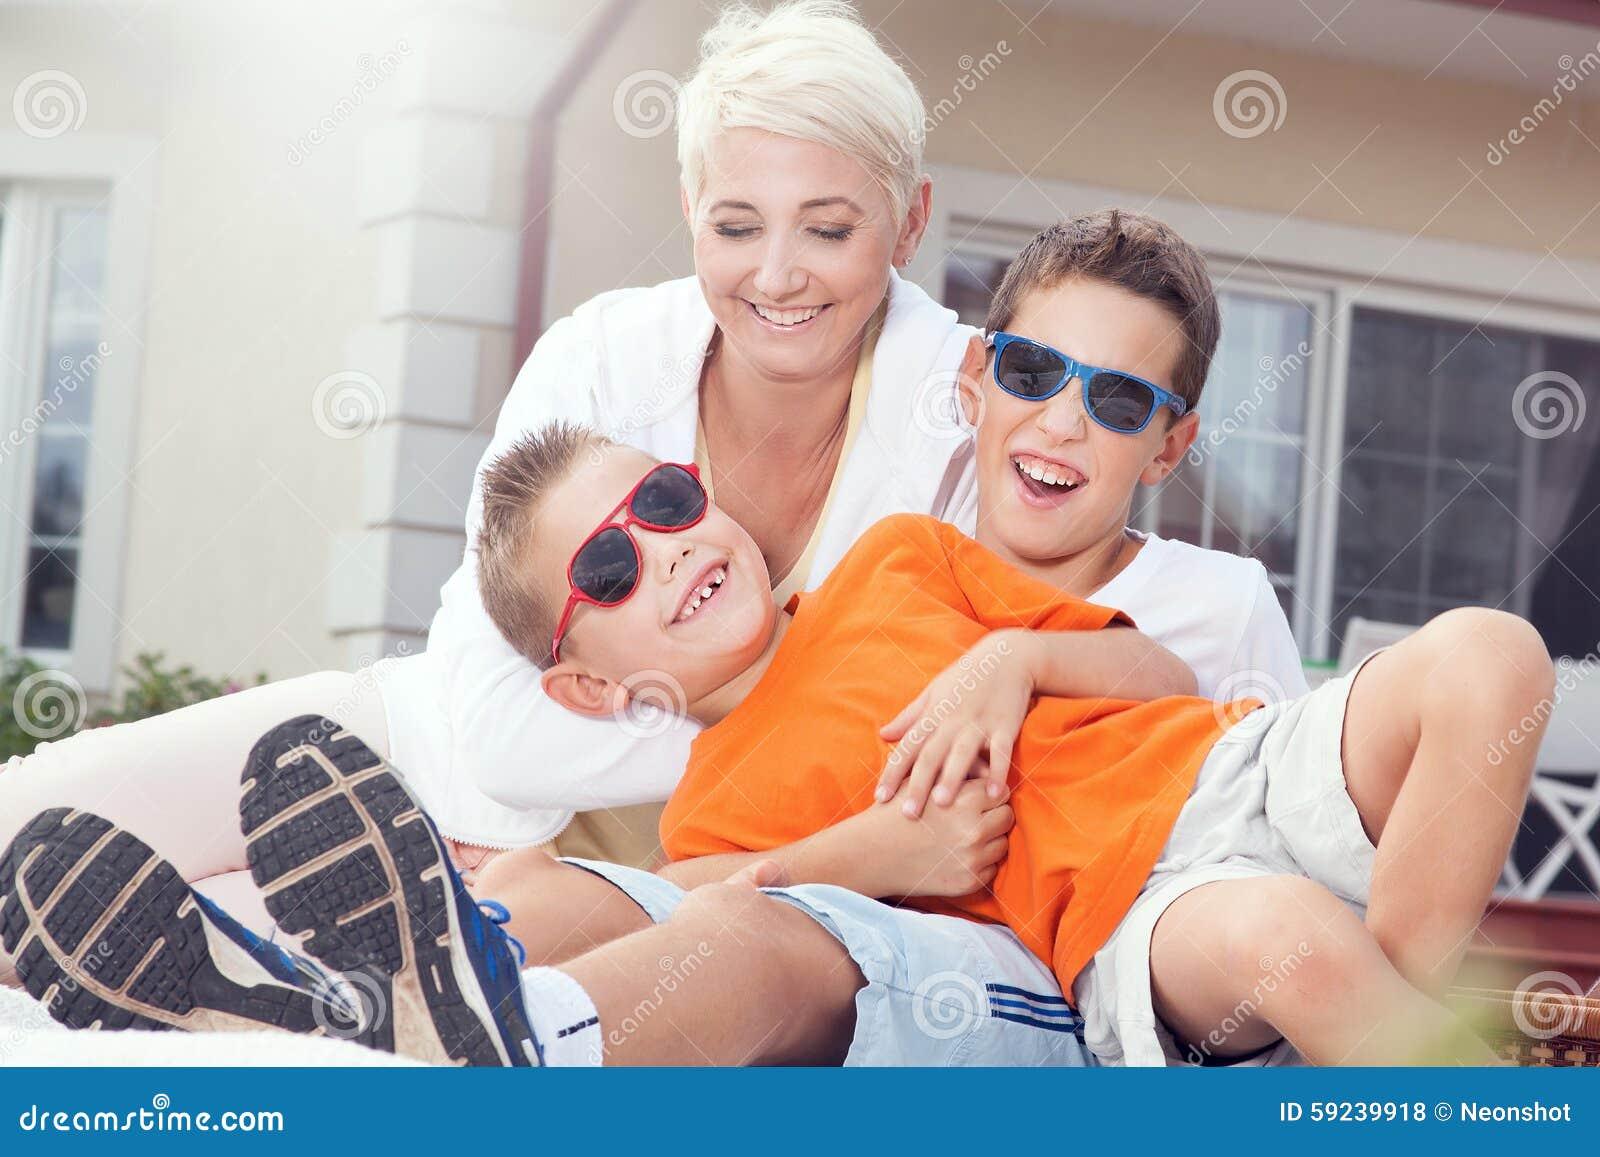 Download Comida Campestre De La Familia Foto de archivo - Imagen de adulto, smiling: 59239918